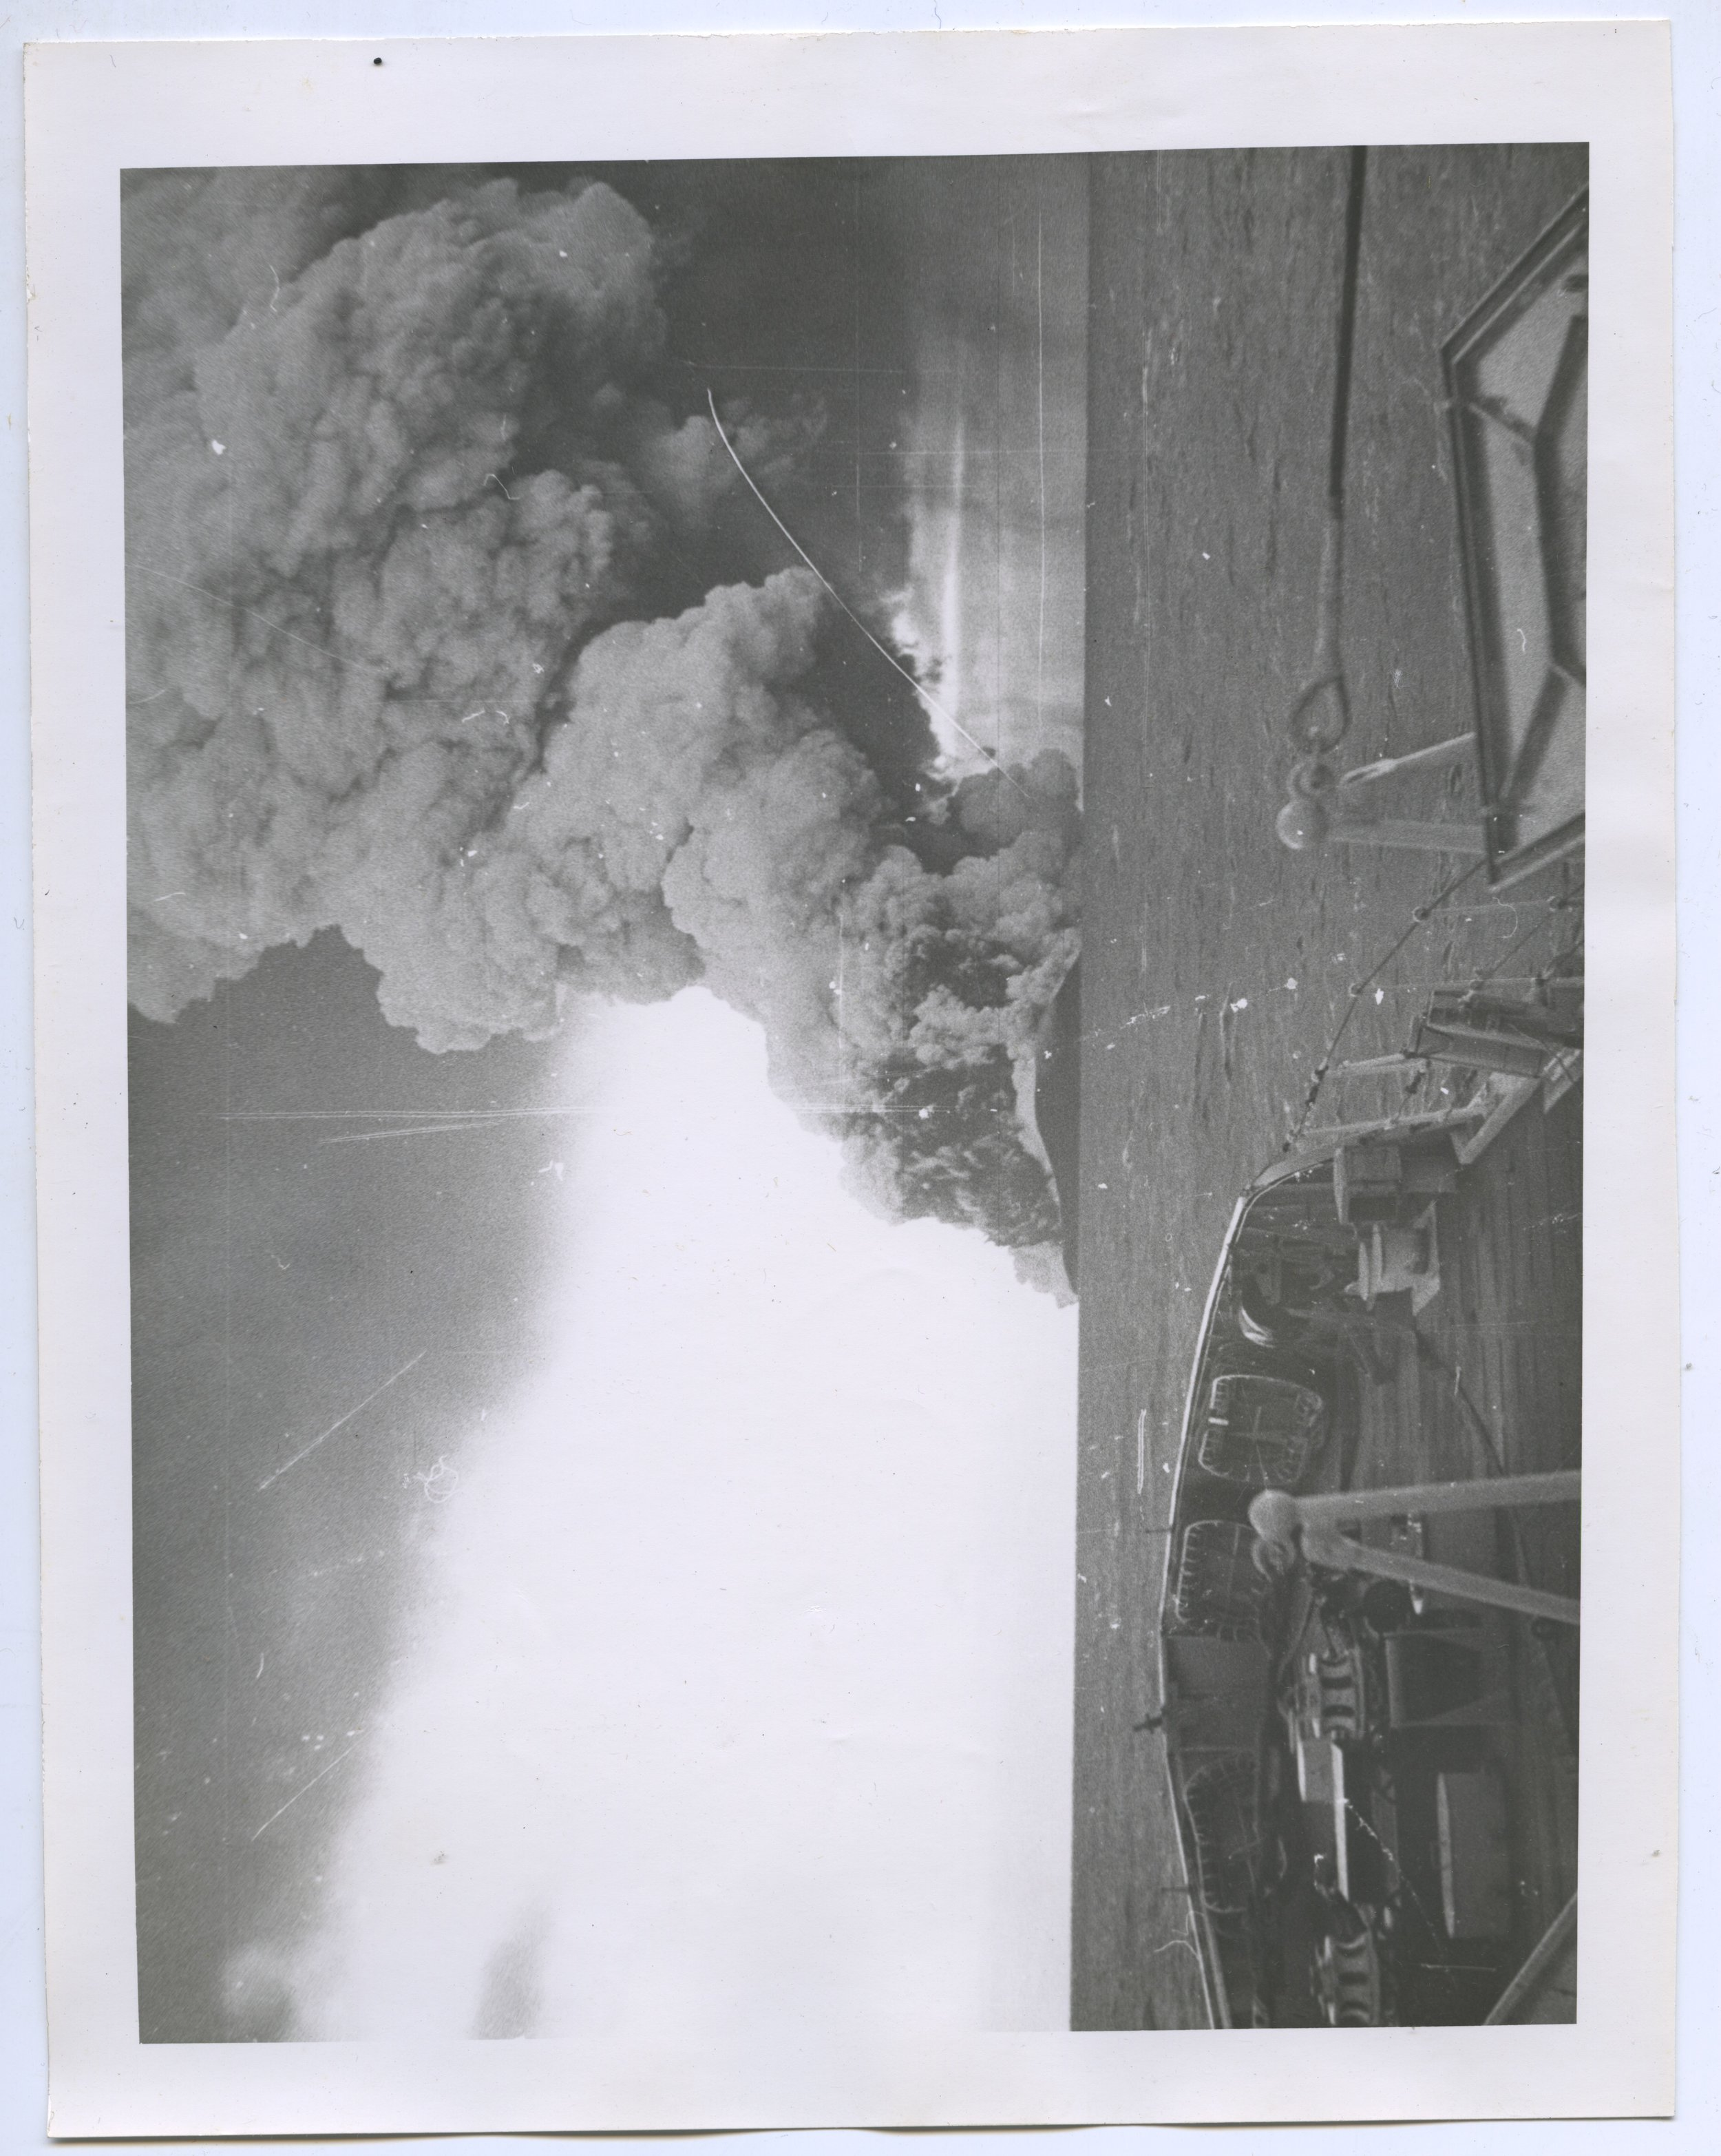 stursay eruption photog swimming chp 8 subaqueous  2.jpeg